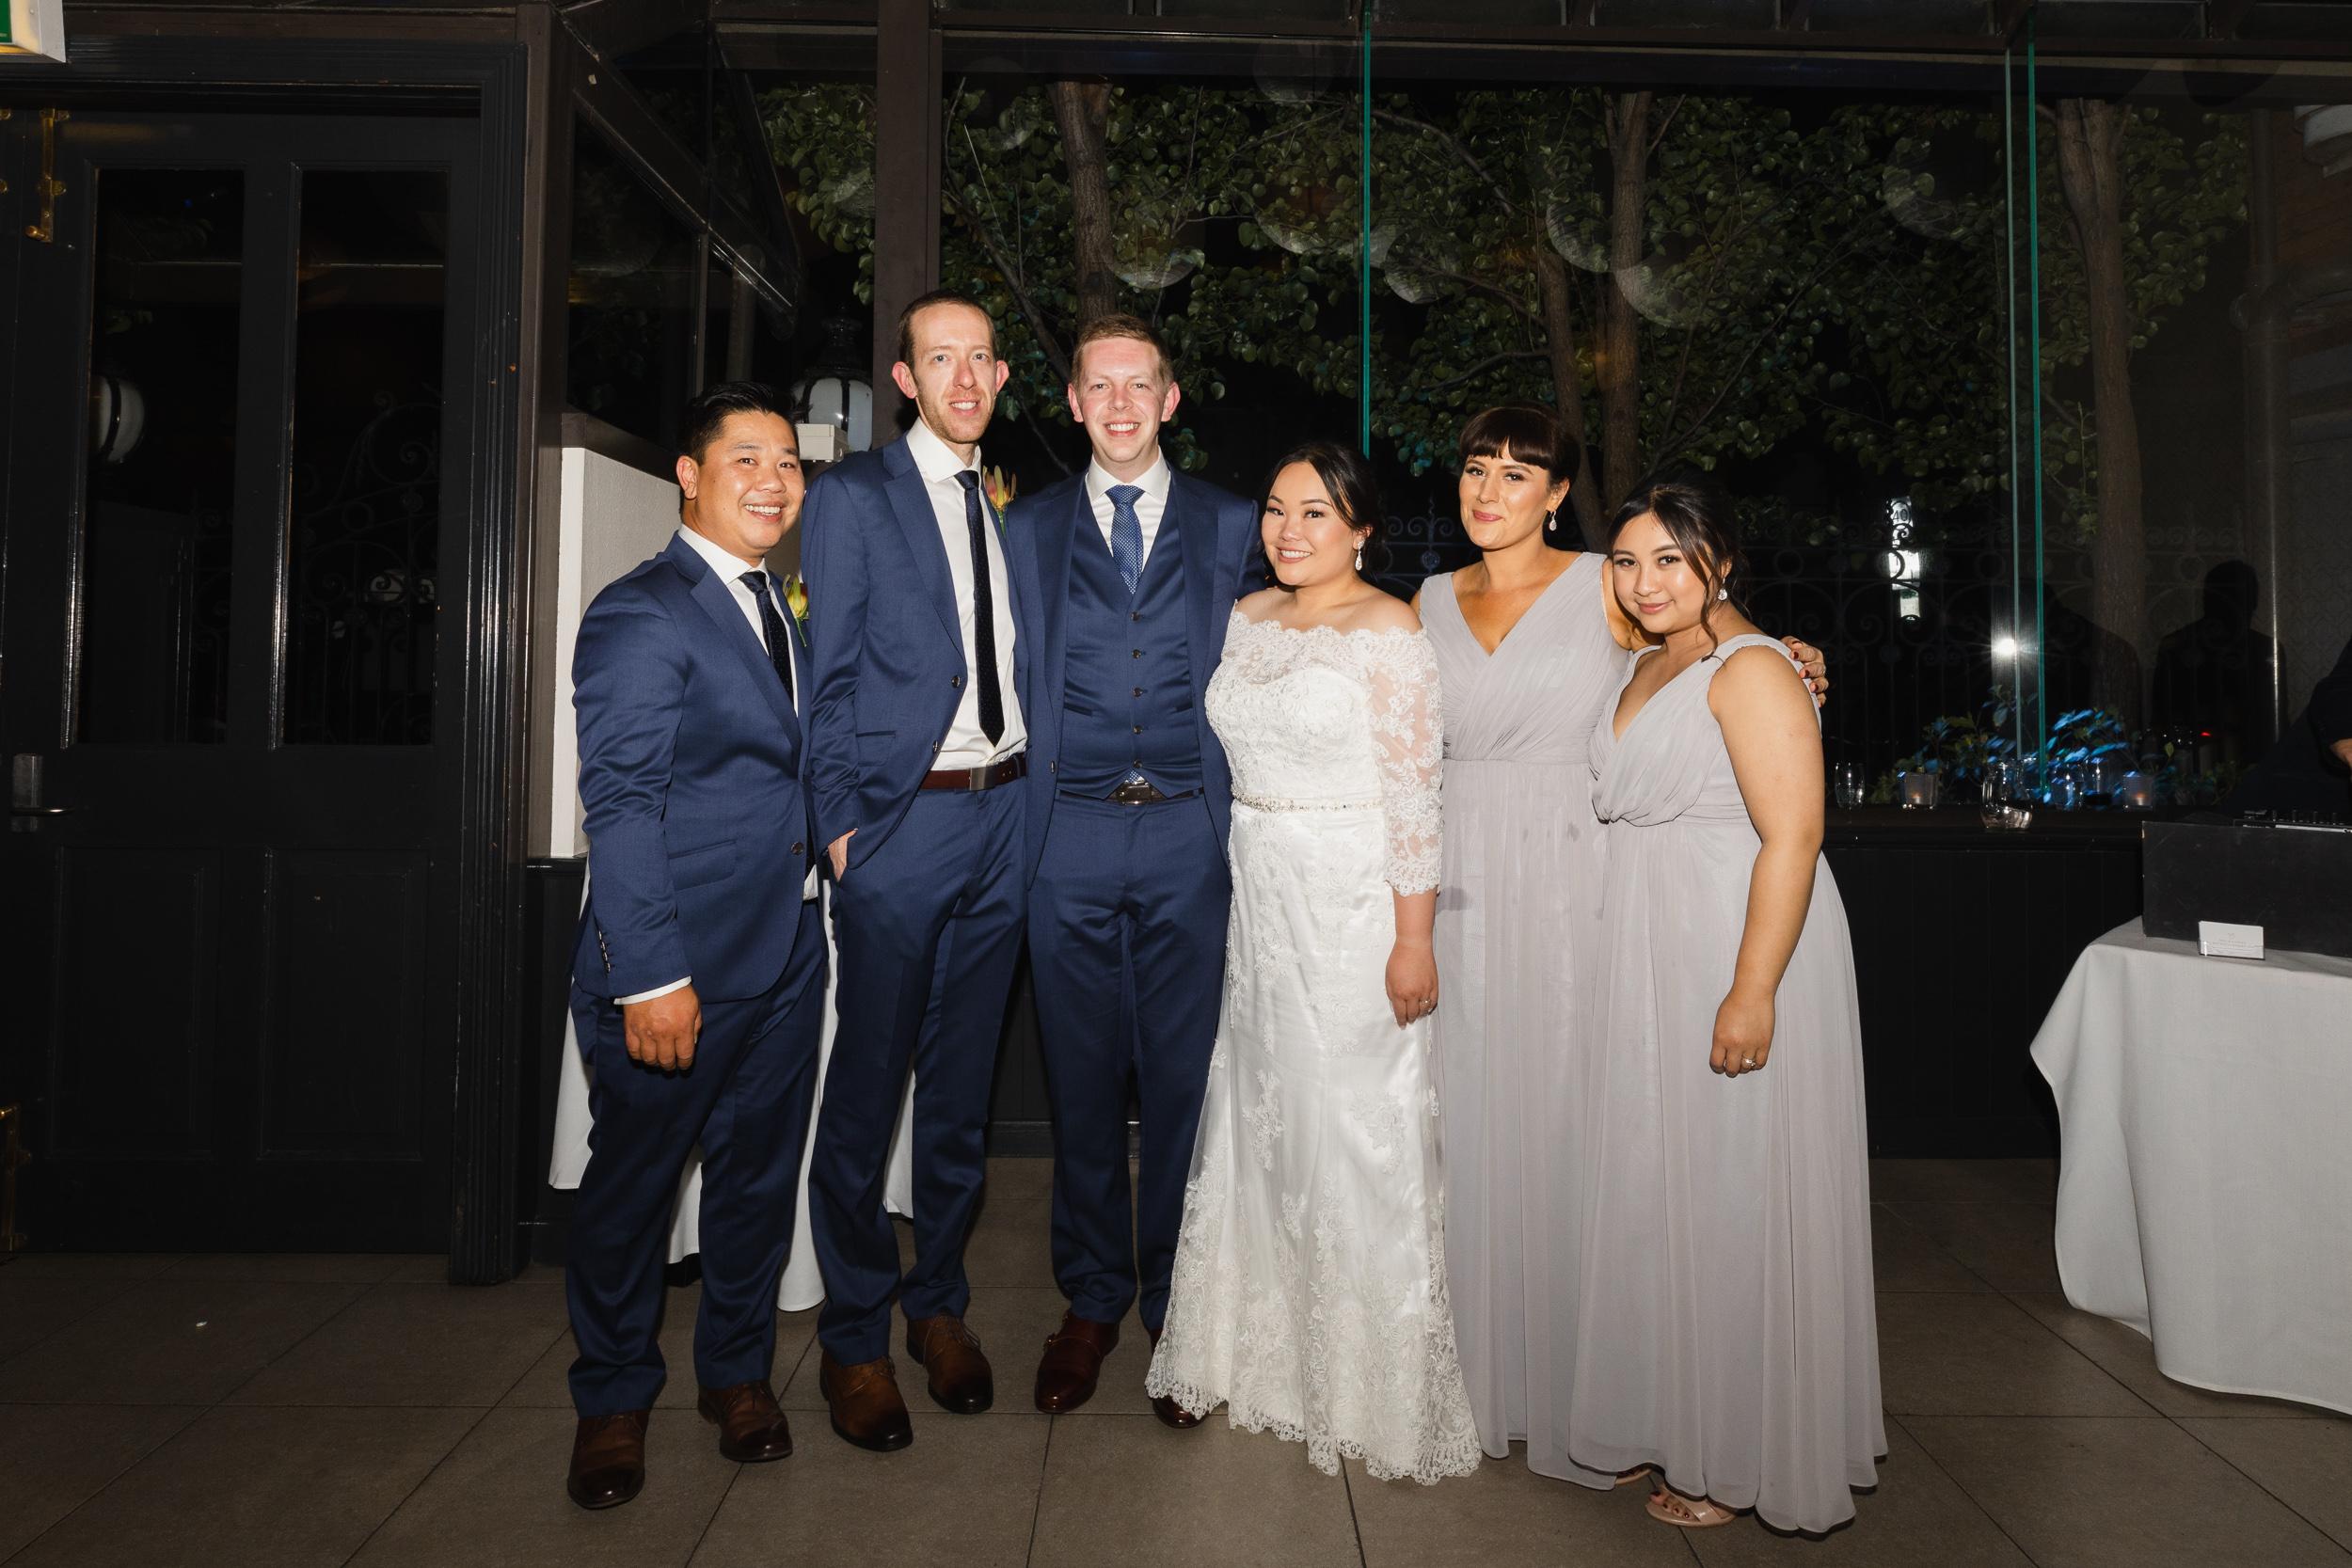 Folkstone-LB-Wedding-Web-388.JPG